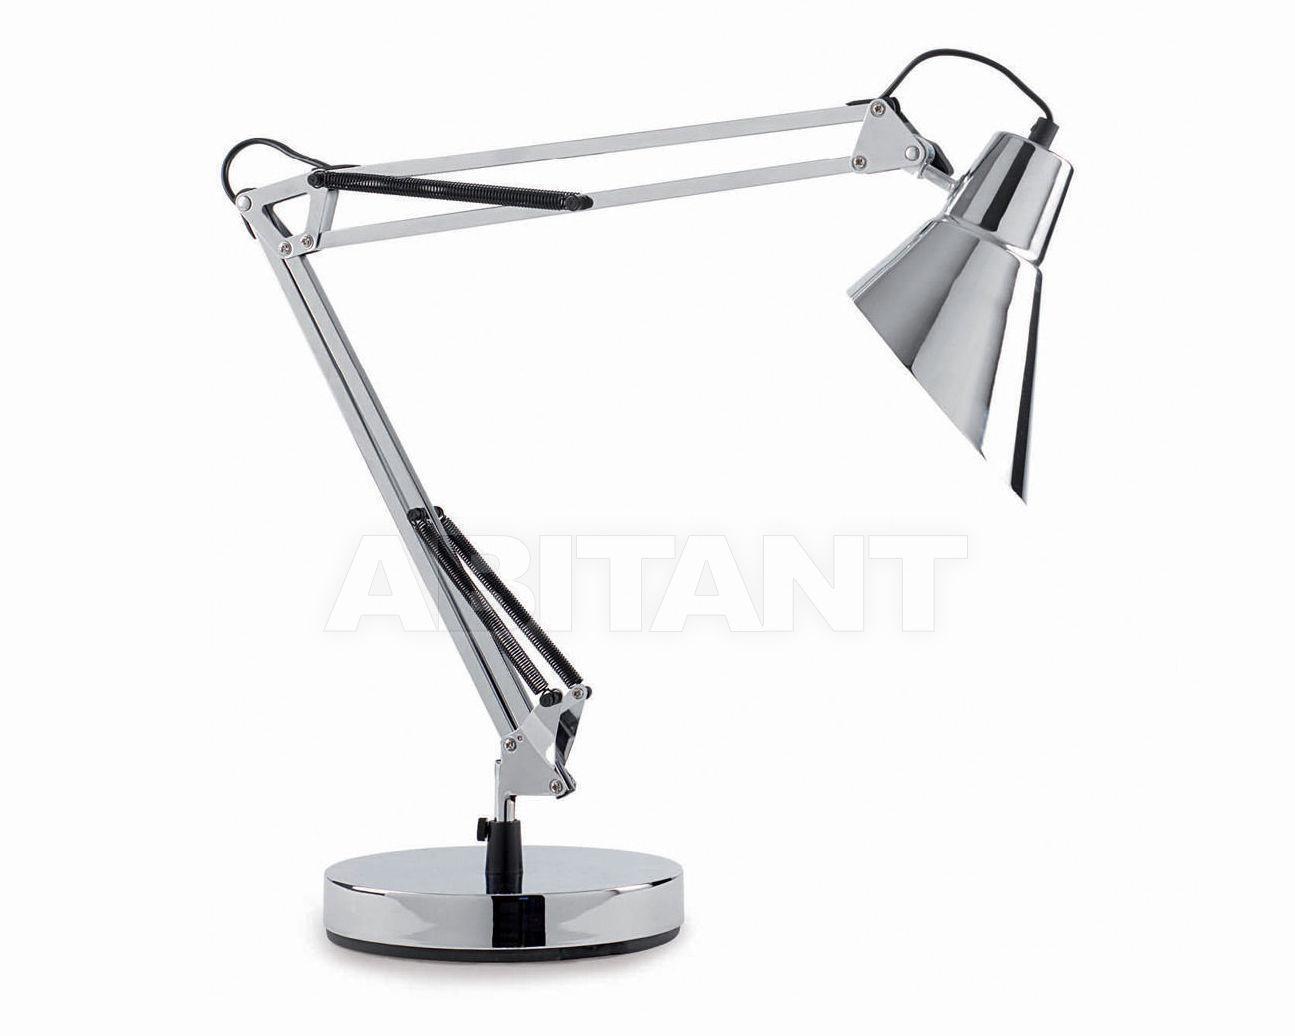 Купить Лампа настольная Ideal Lux 2013-2014 SALLY TL1 CROMO